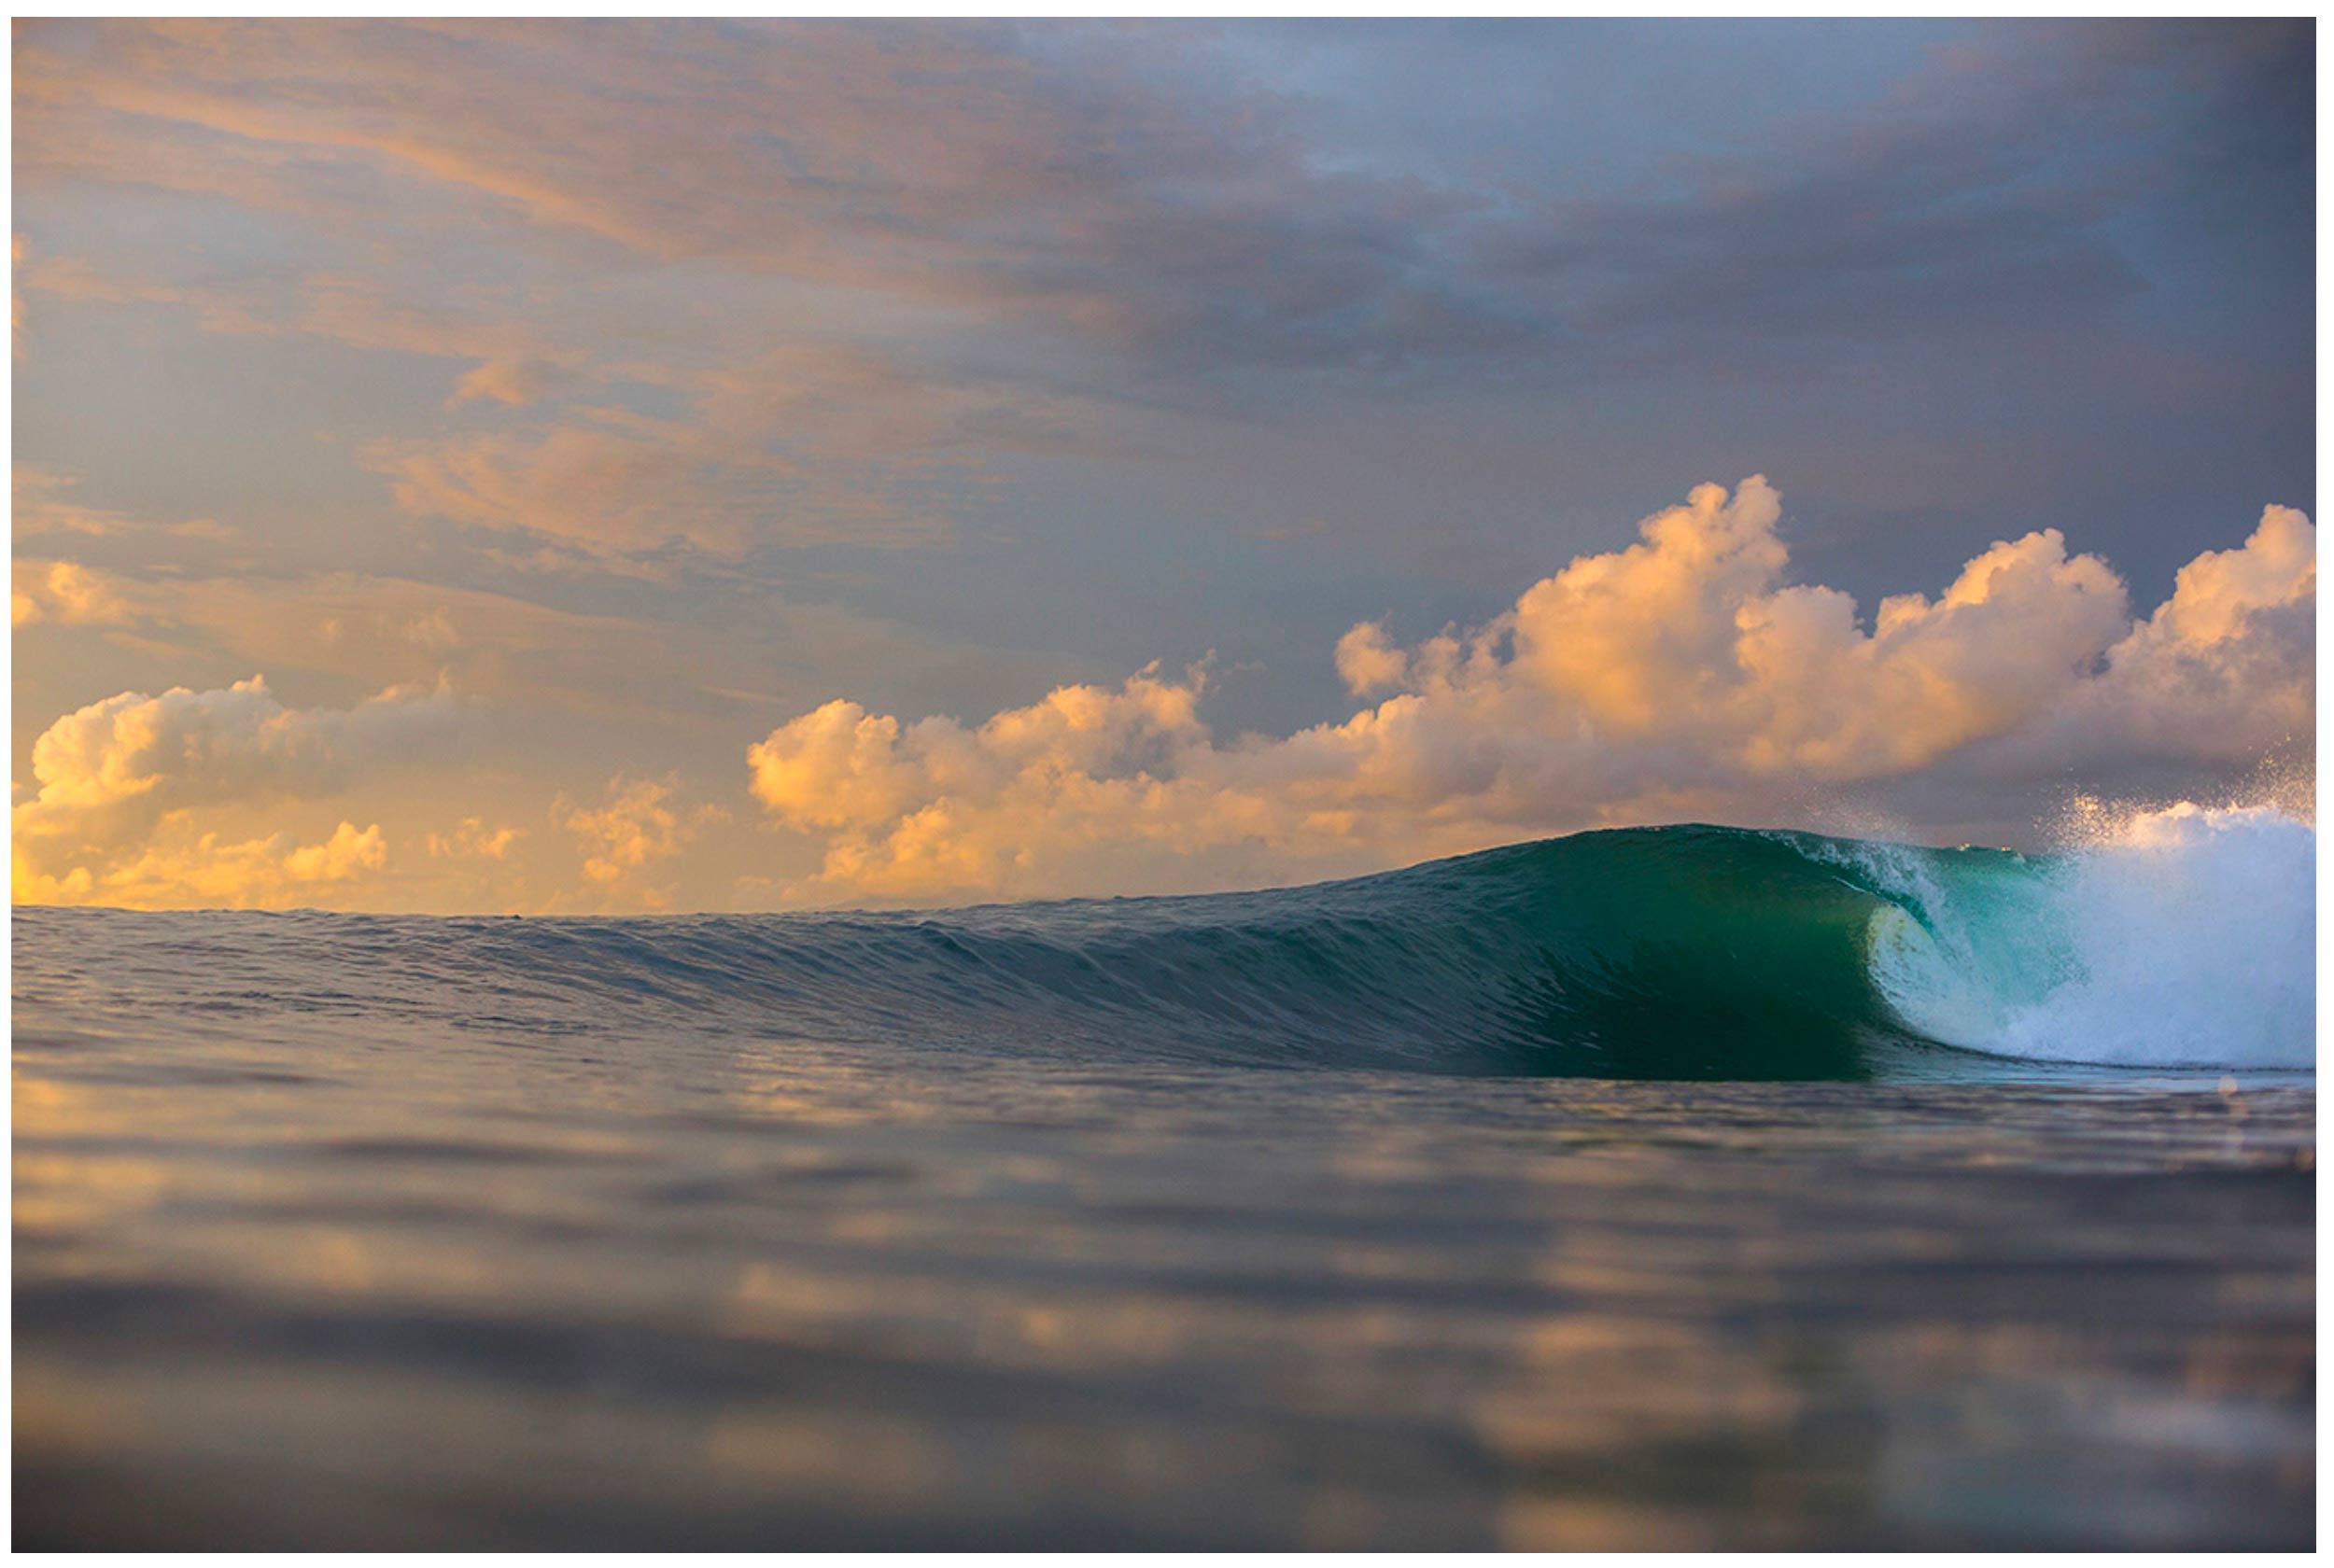 rodd-owen-ocean-surf-photography-for-sale-149.jpg